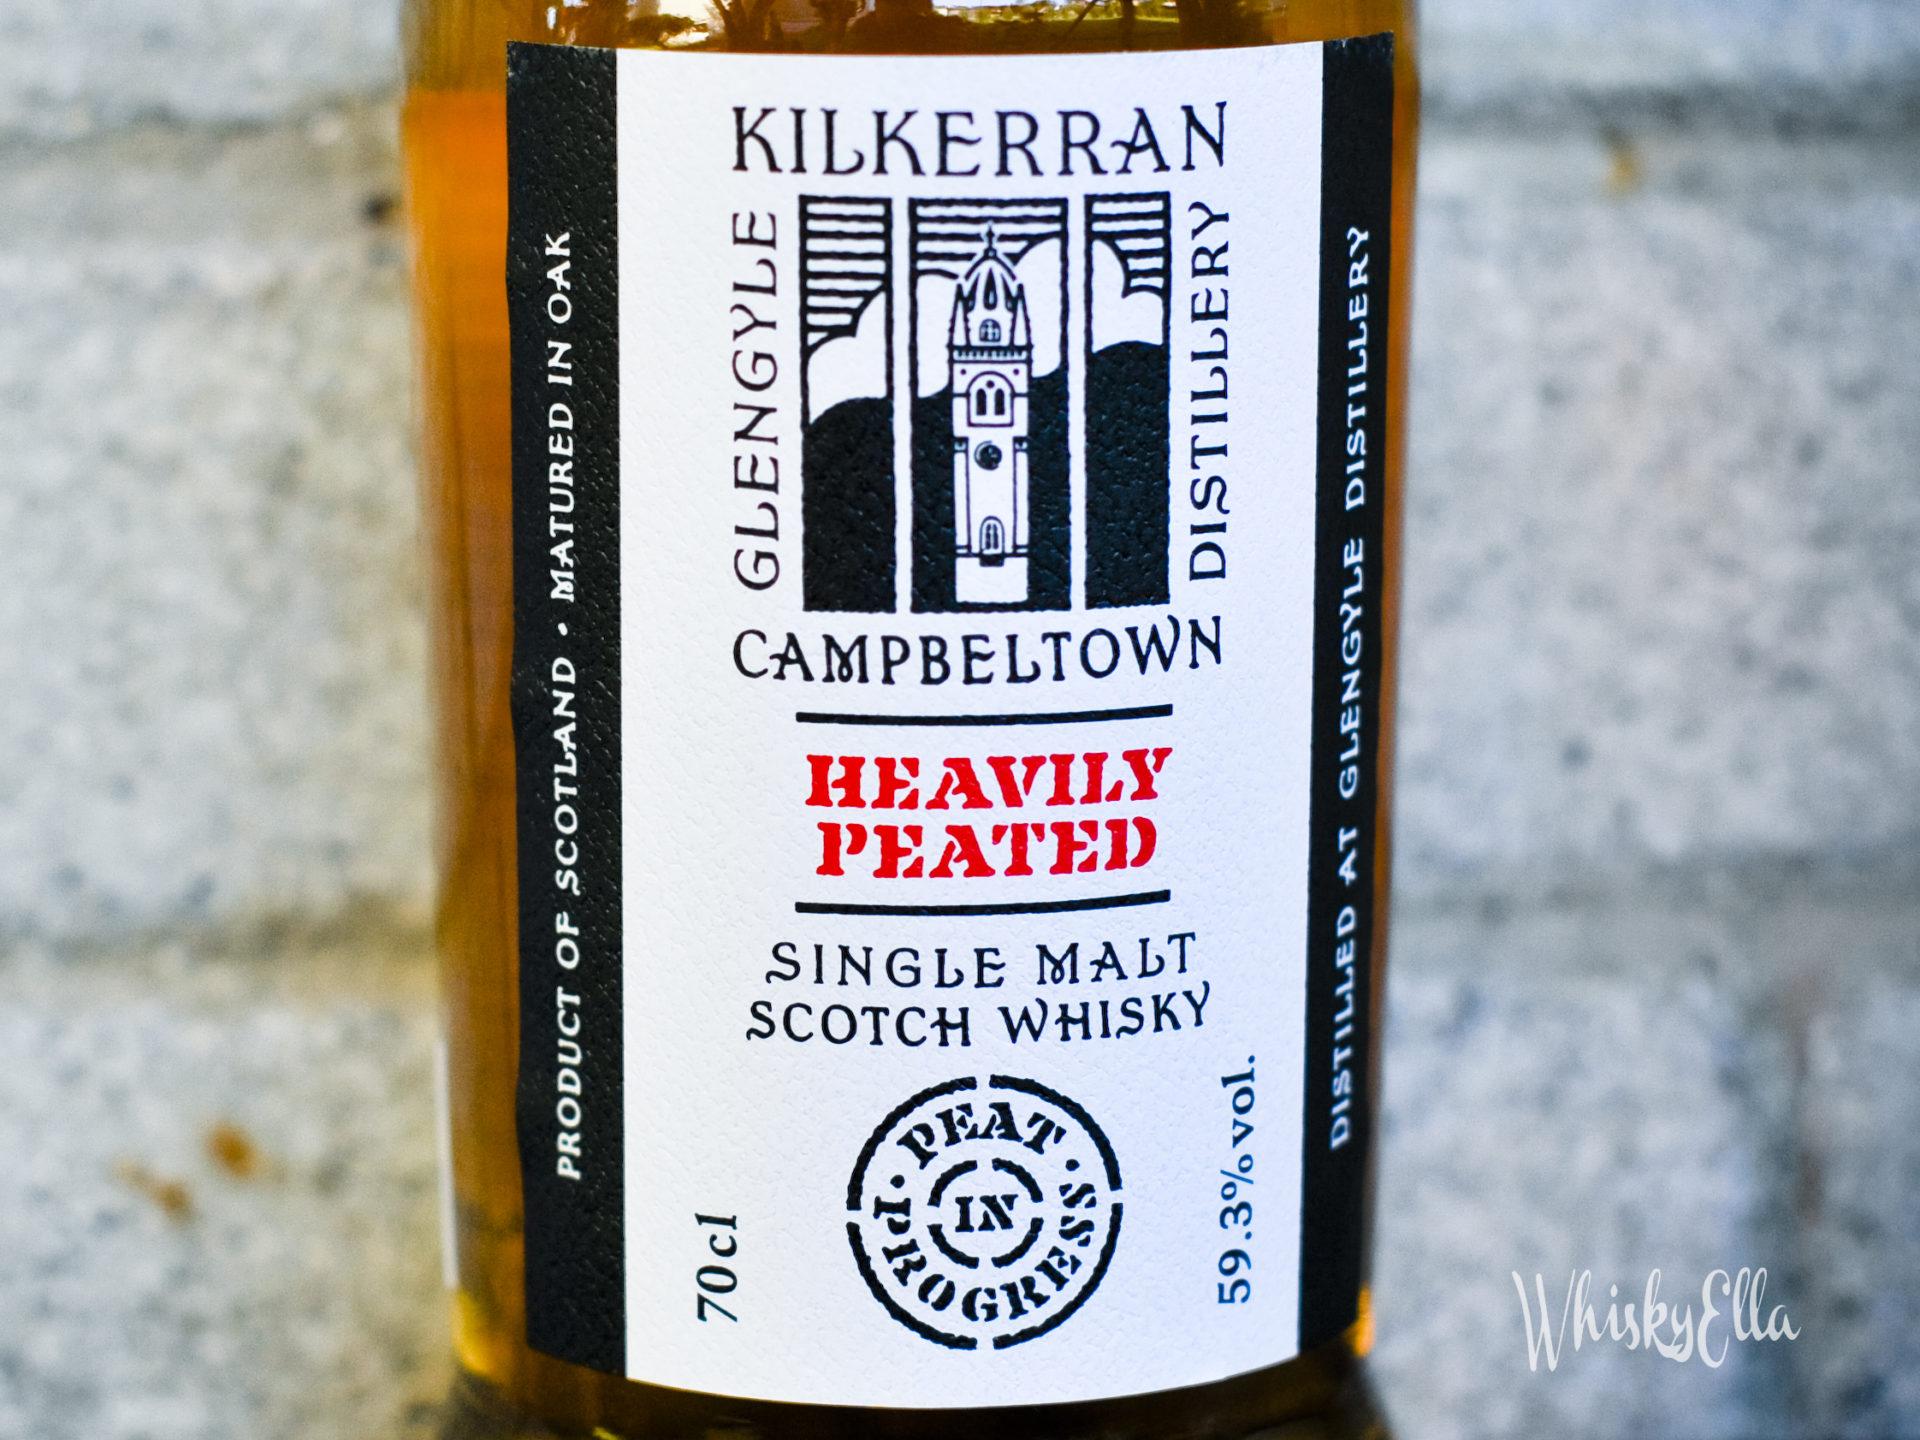 Nasza recenzja Kilkerran Heavily Peated Peat in Progress Batch No. 1 #40